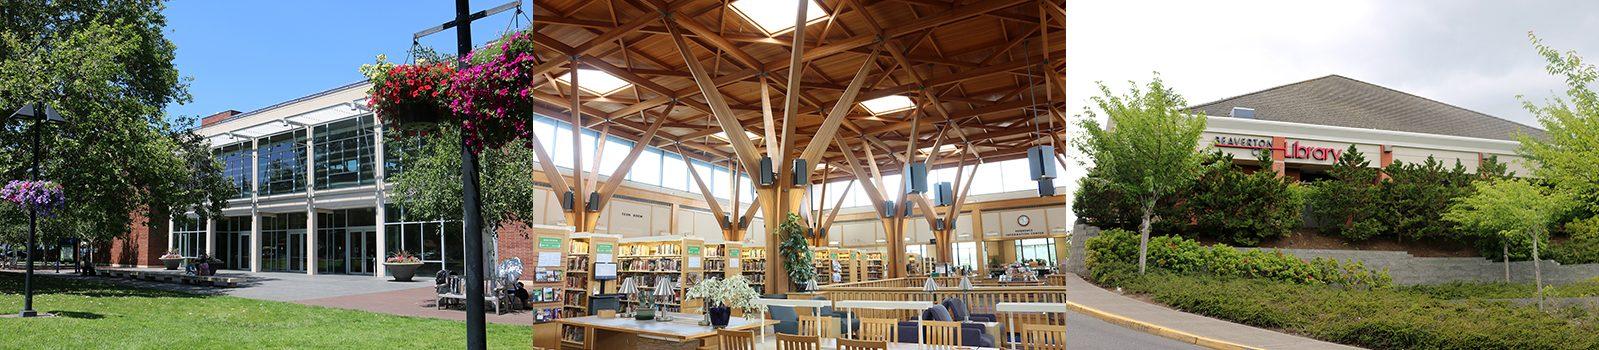 Beaverton Library Foundation